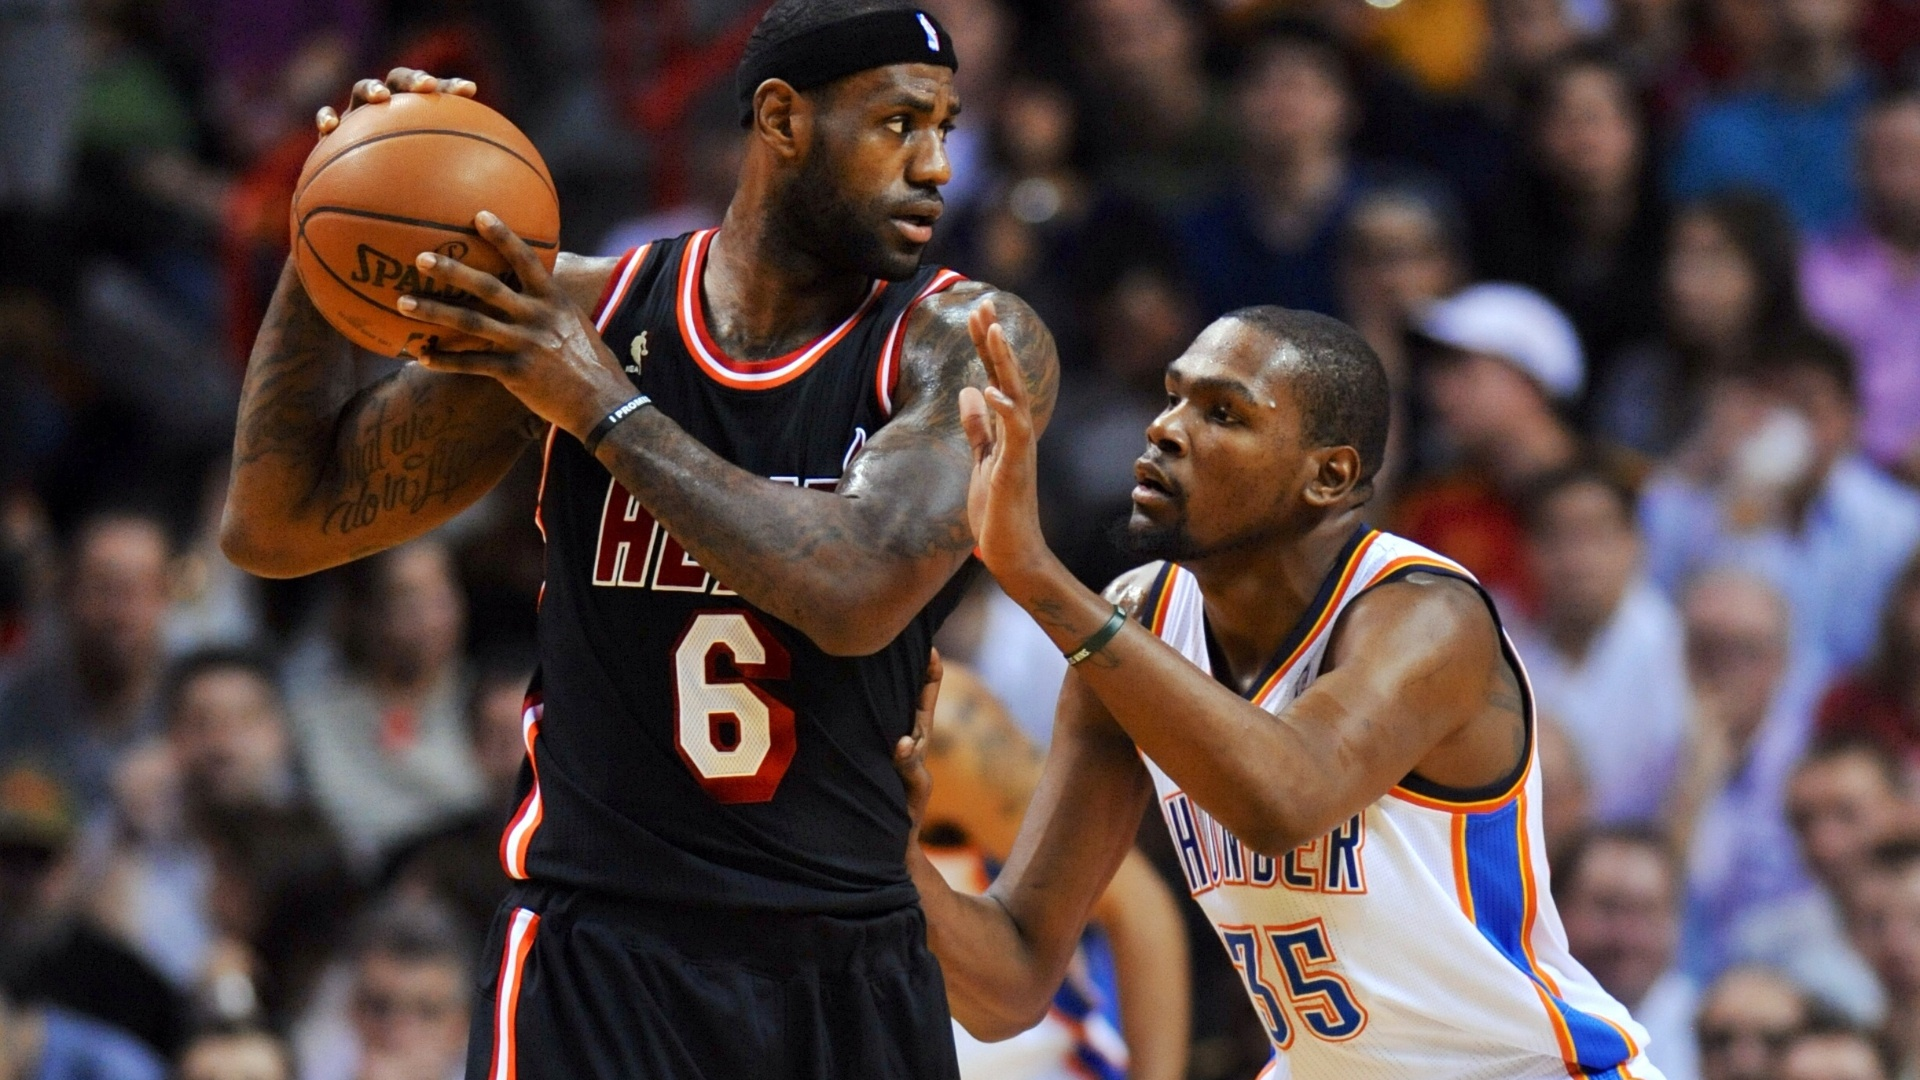 30.jan.2014 - LeBron James tenta proteger a bola de Kevin Durant durante jogo entre Heat e Thunder